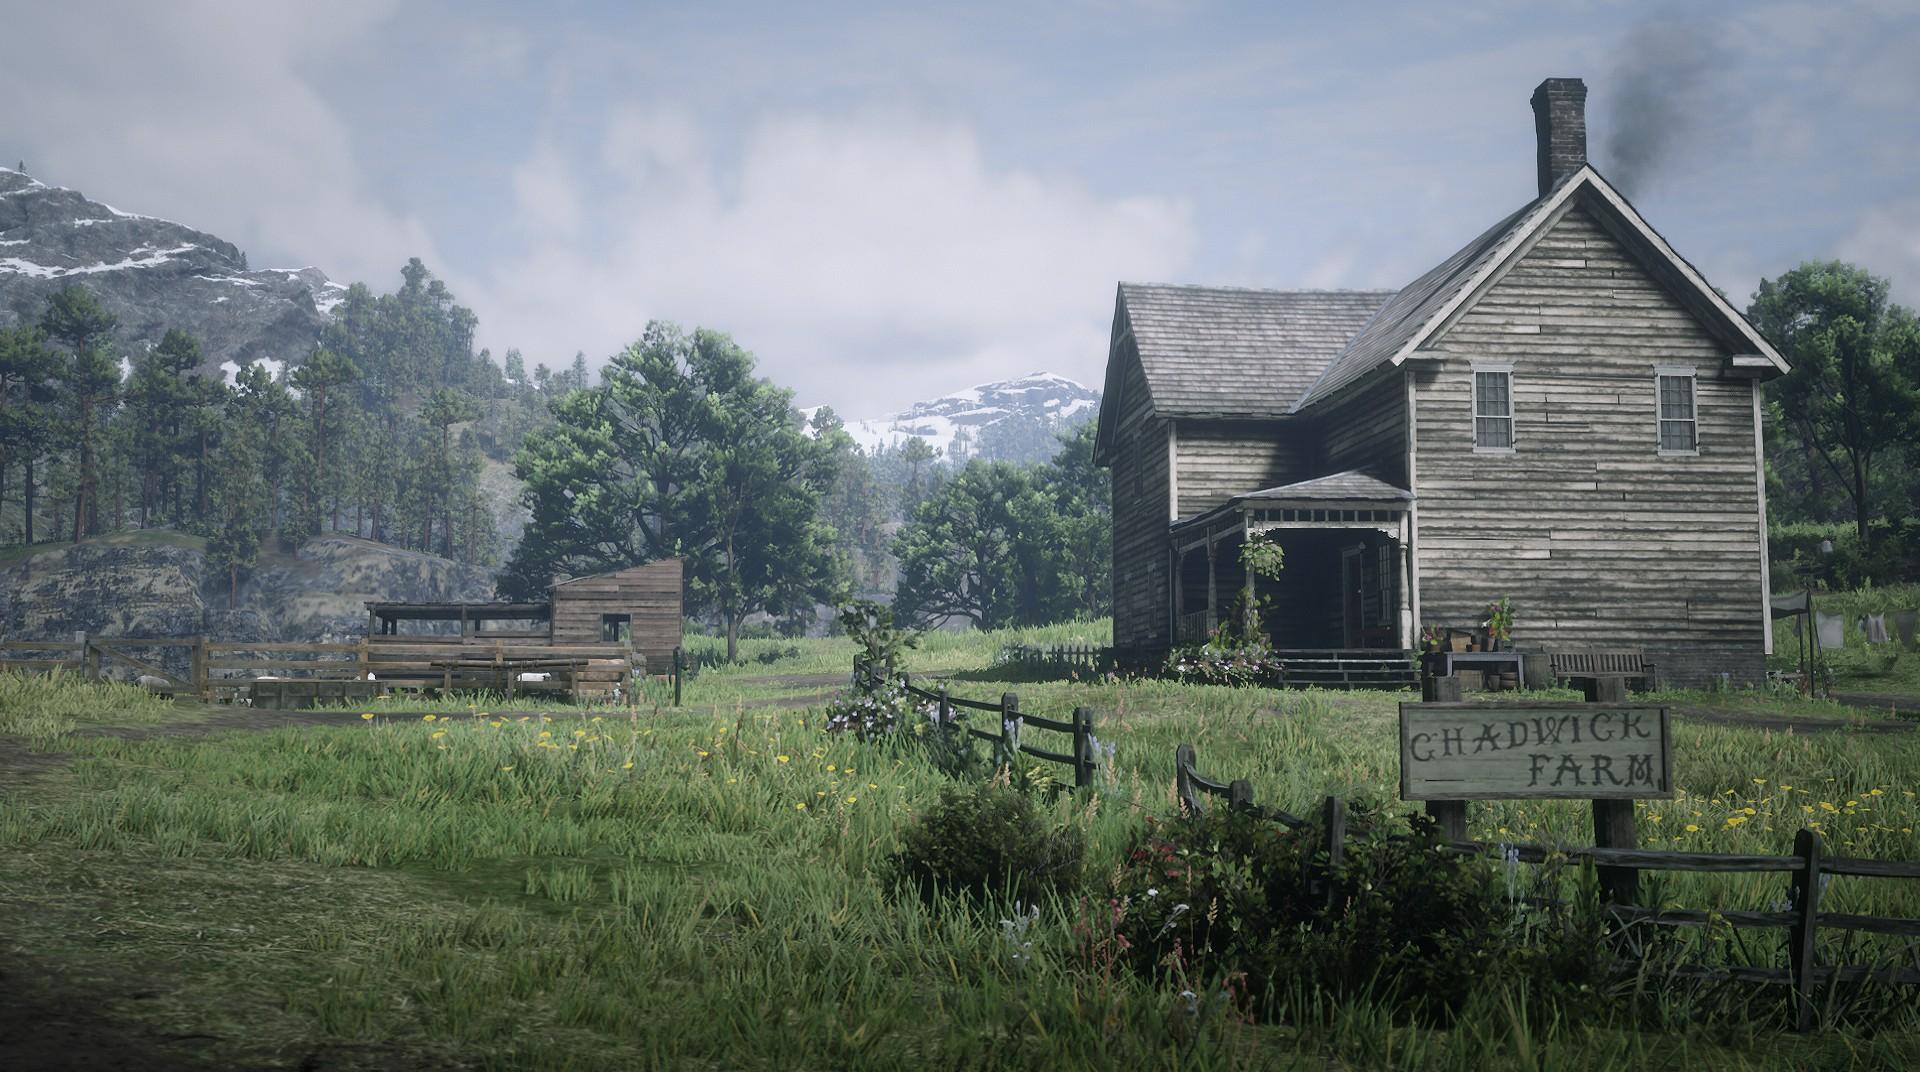 Chadwick Farm